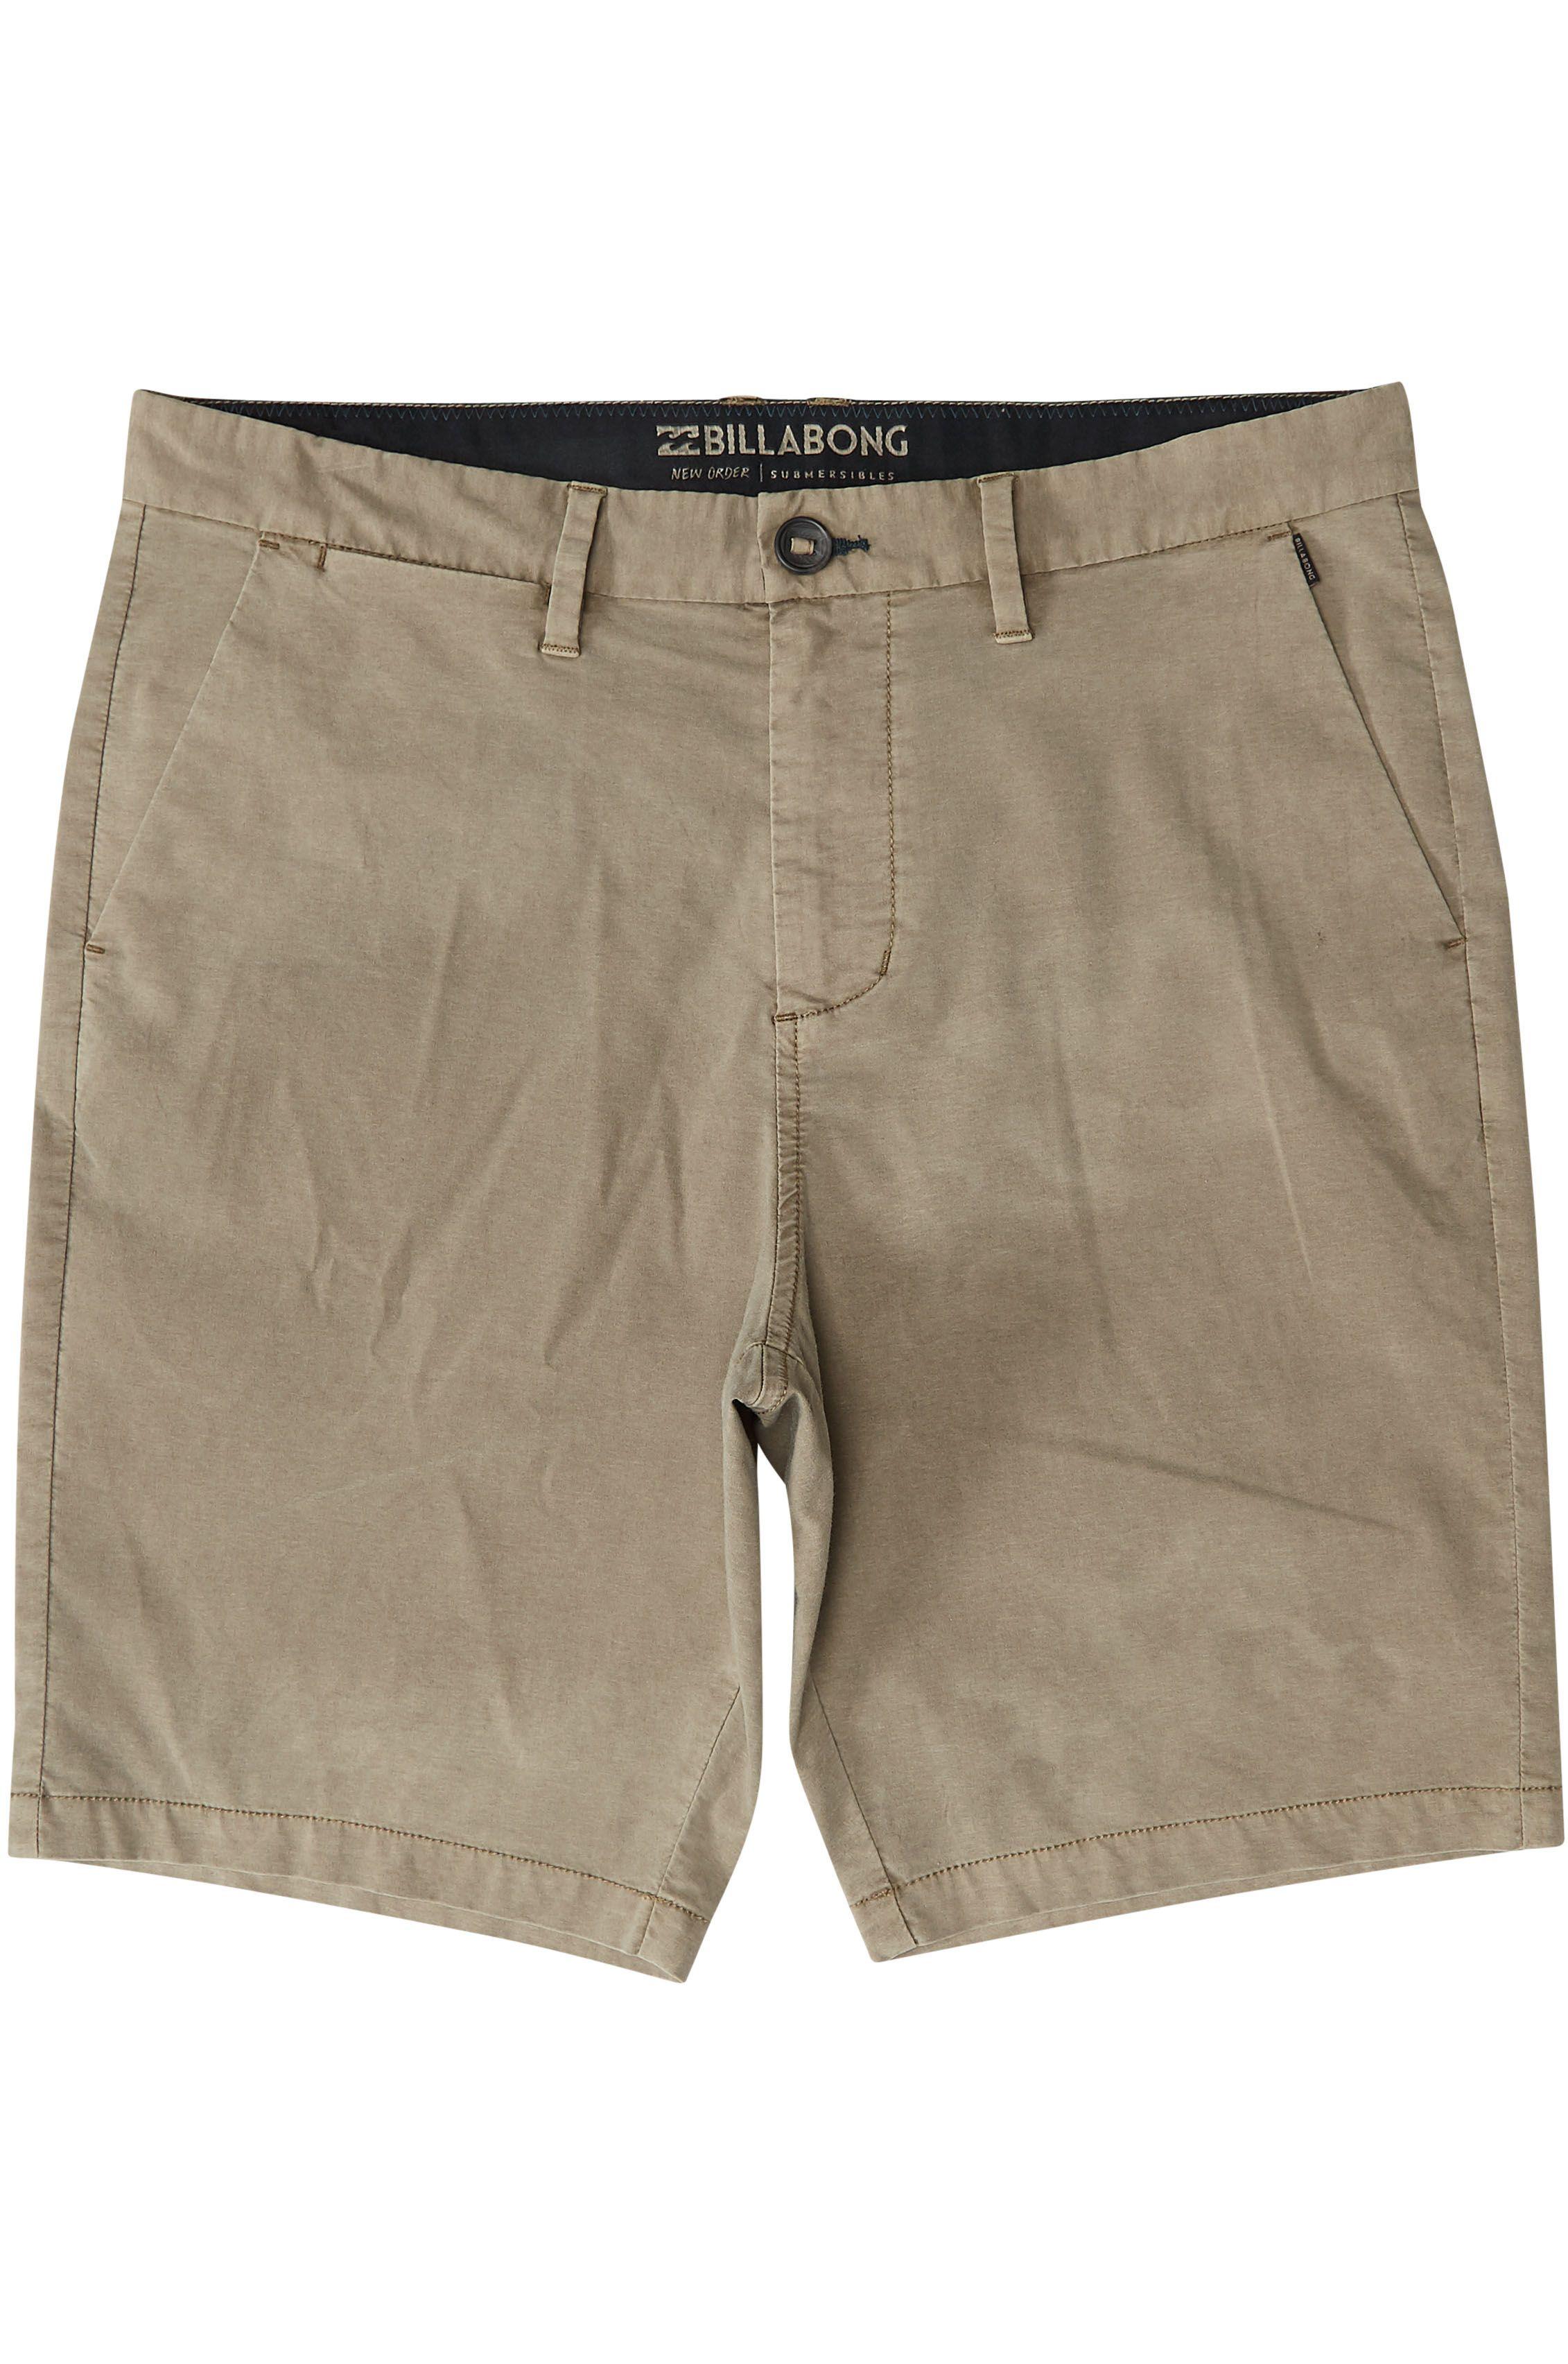 Walkshorts Billabong NEW ORDER X OVD Khaki